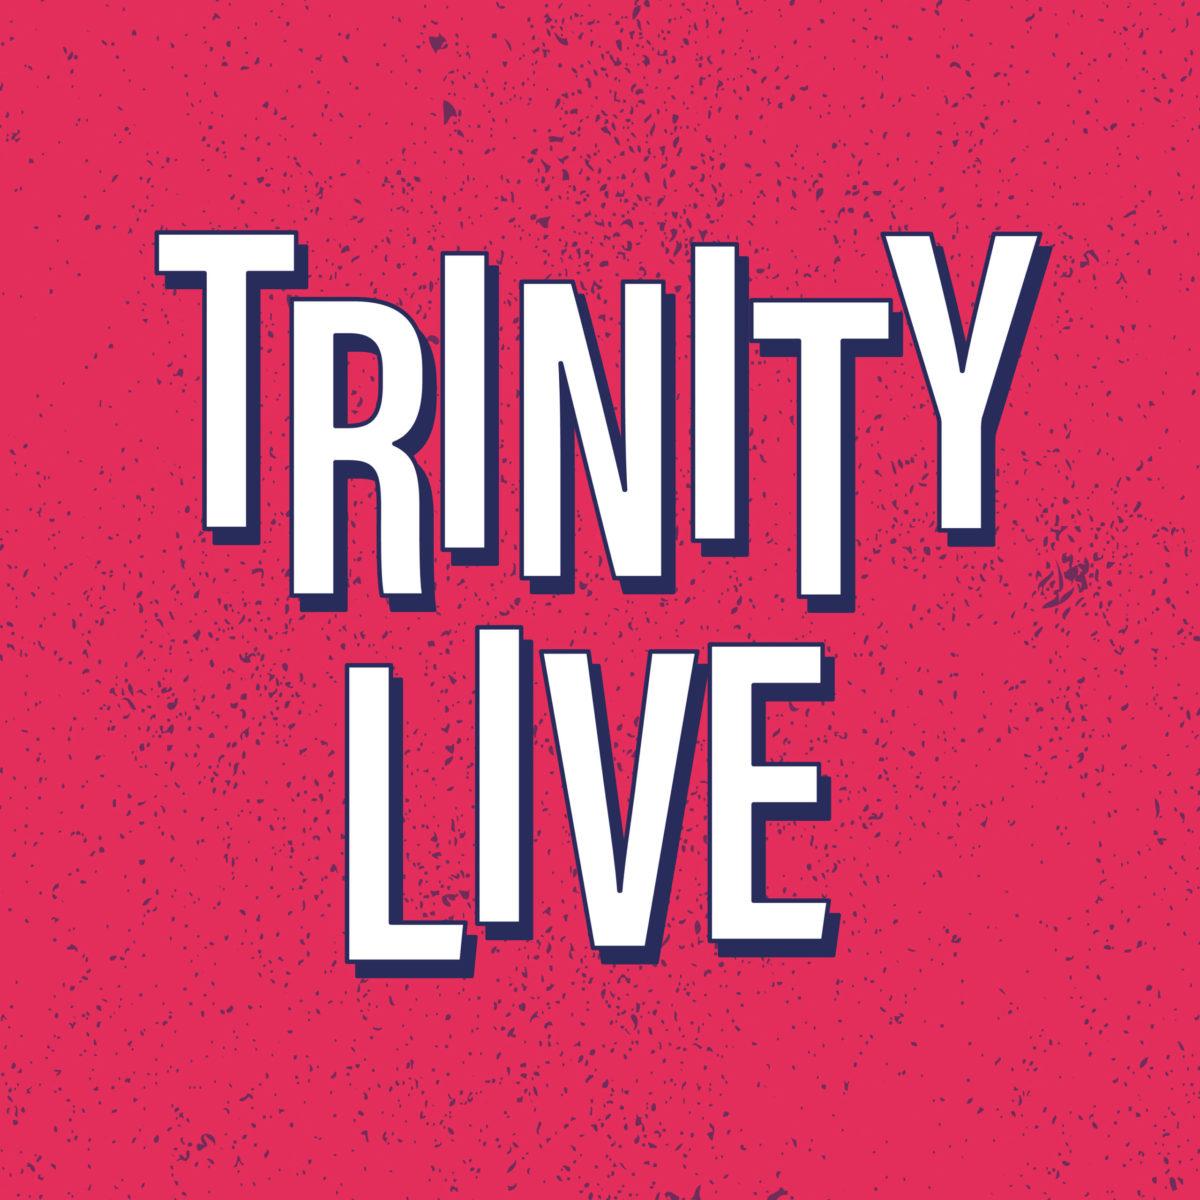 Trinity Live poster